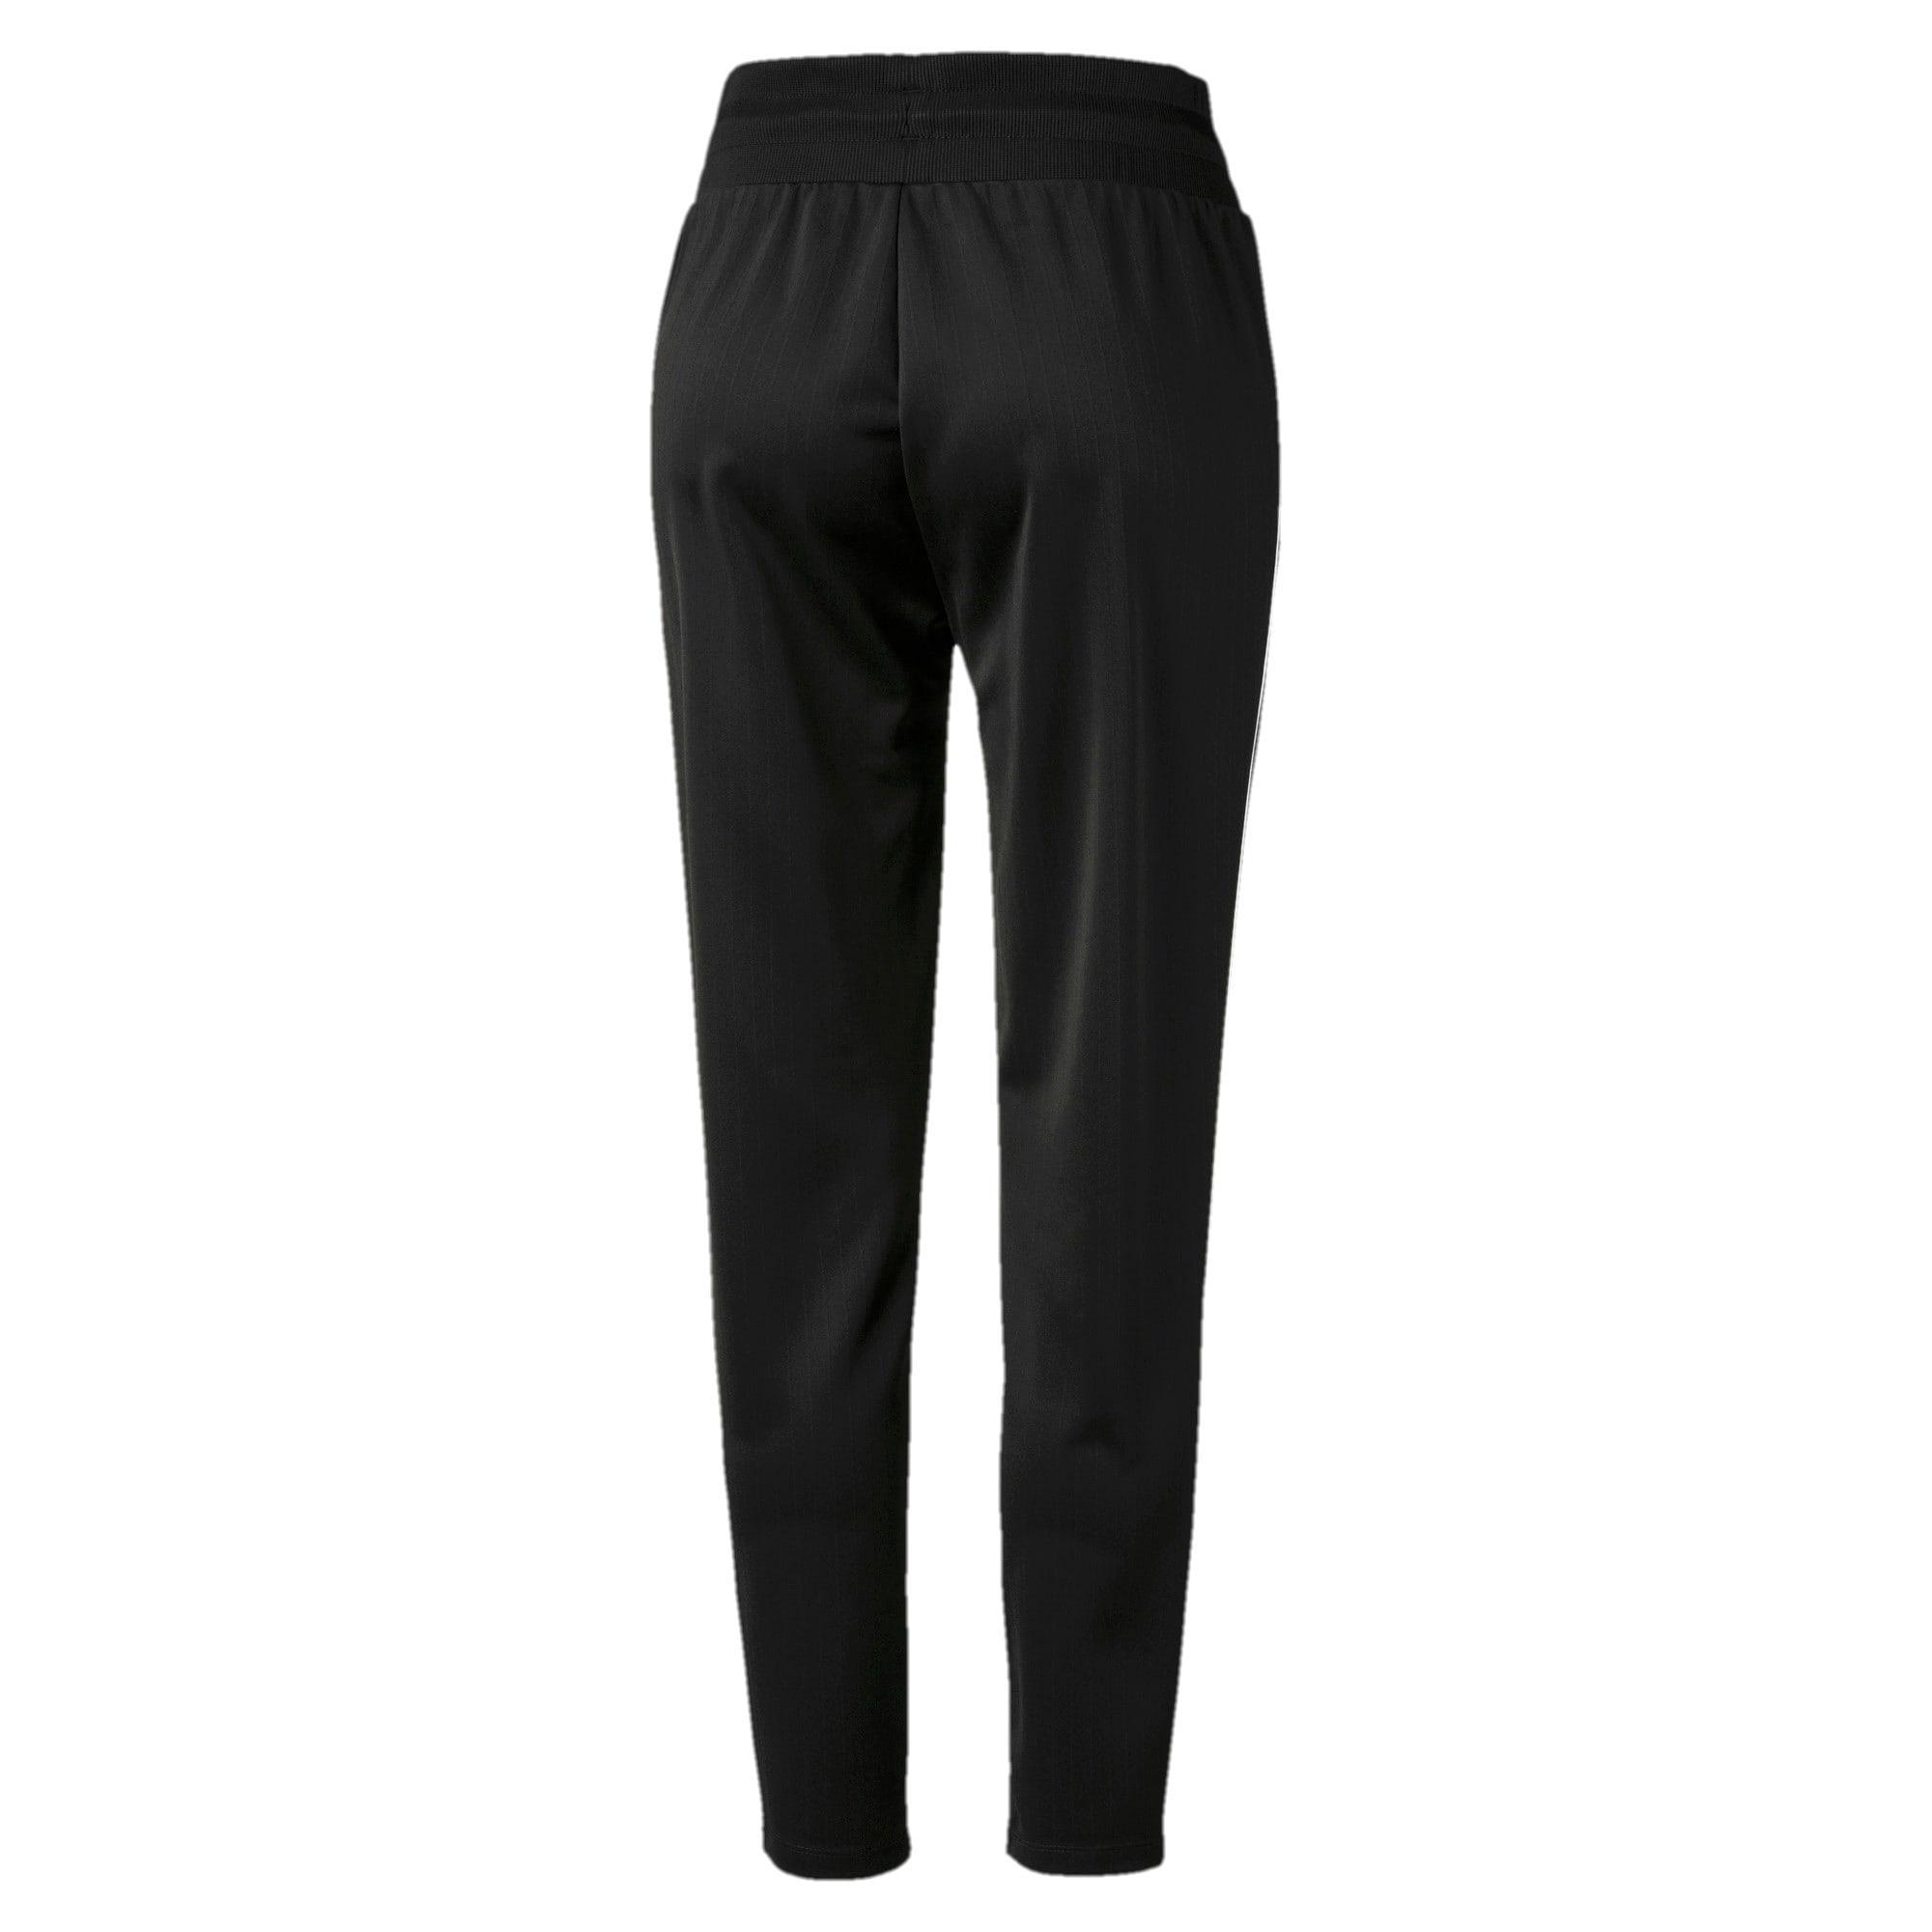 Thumbnail 5 of Classics Poly Knitted Women's Track Pants, Puma Black, medium